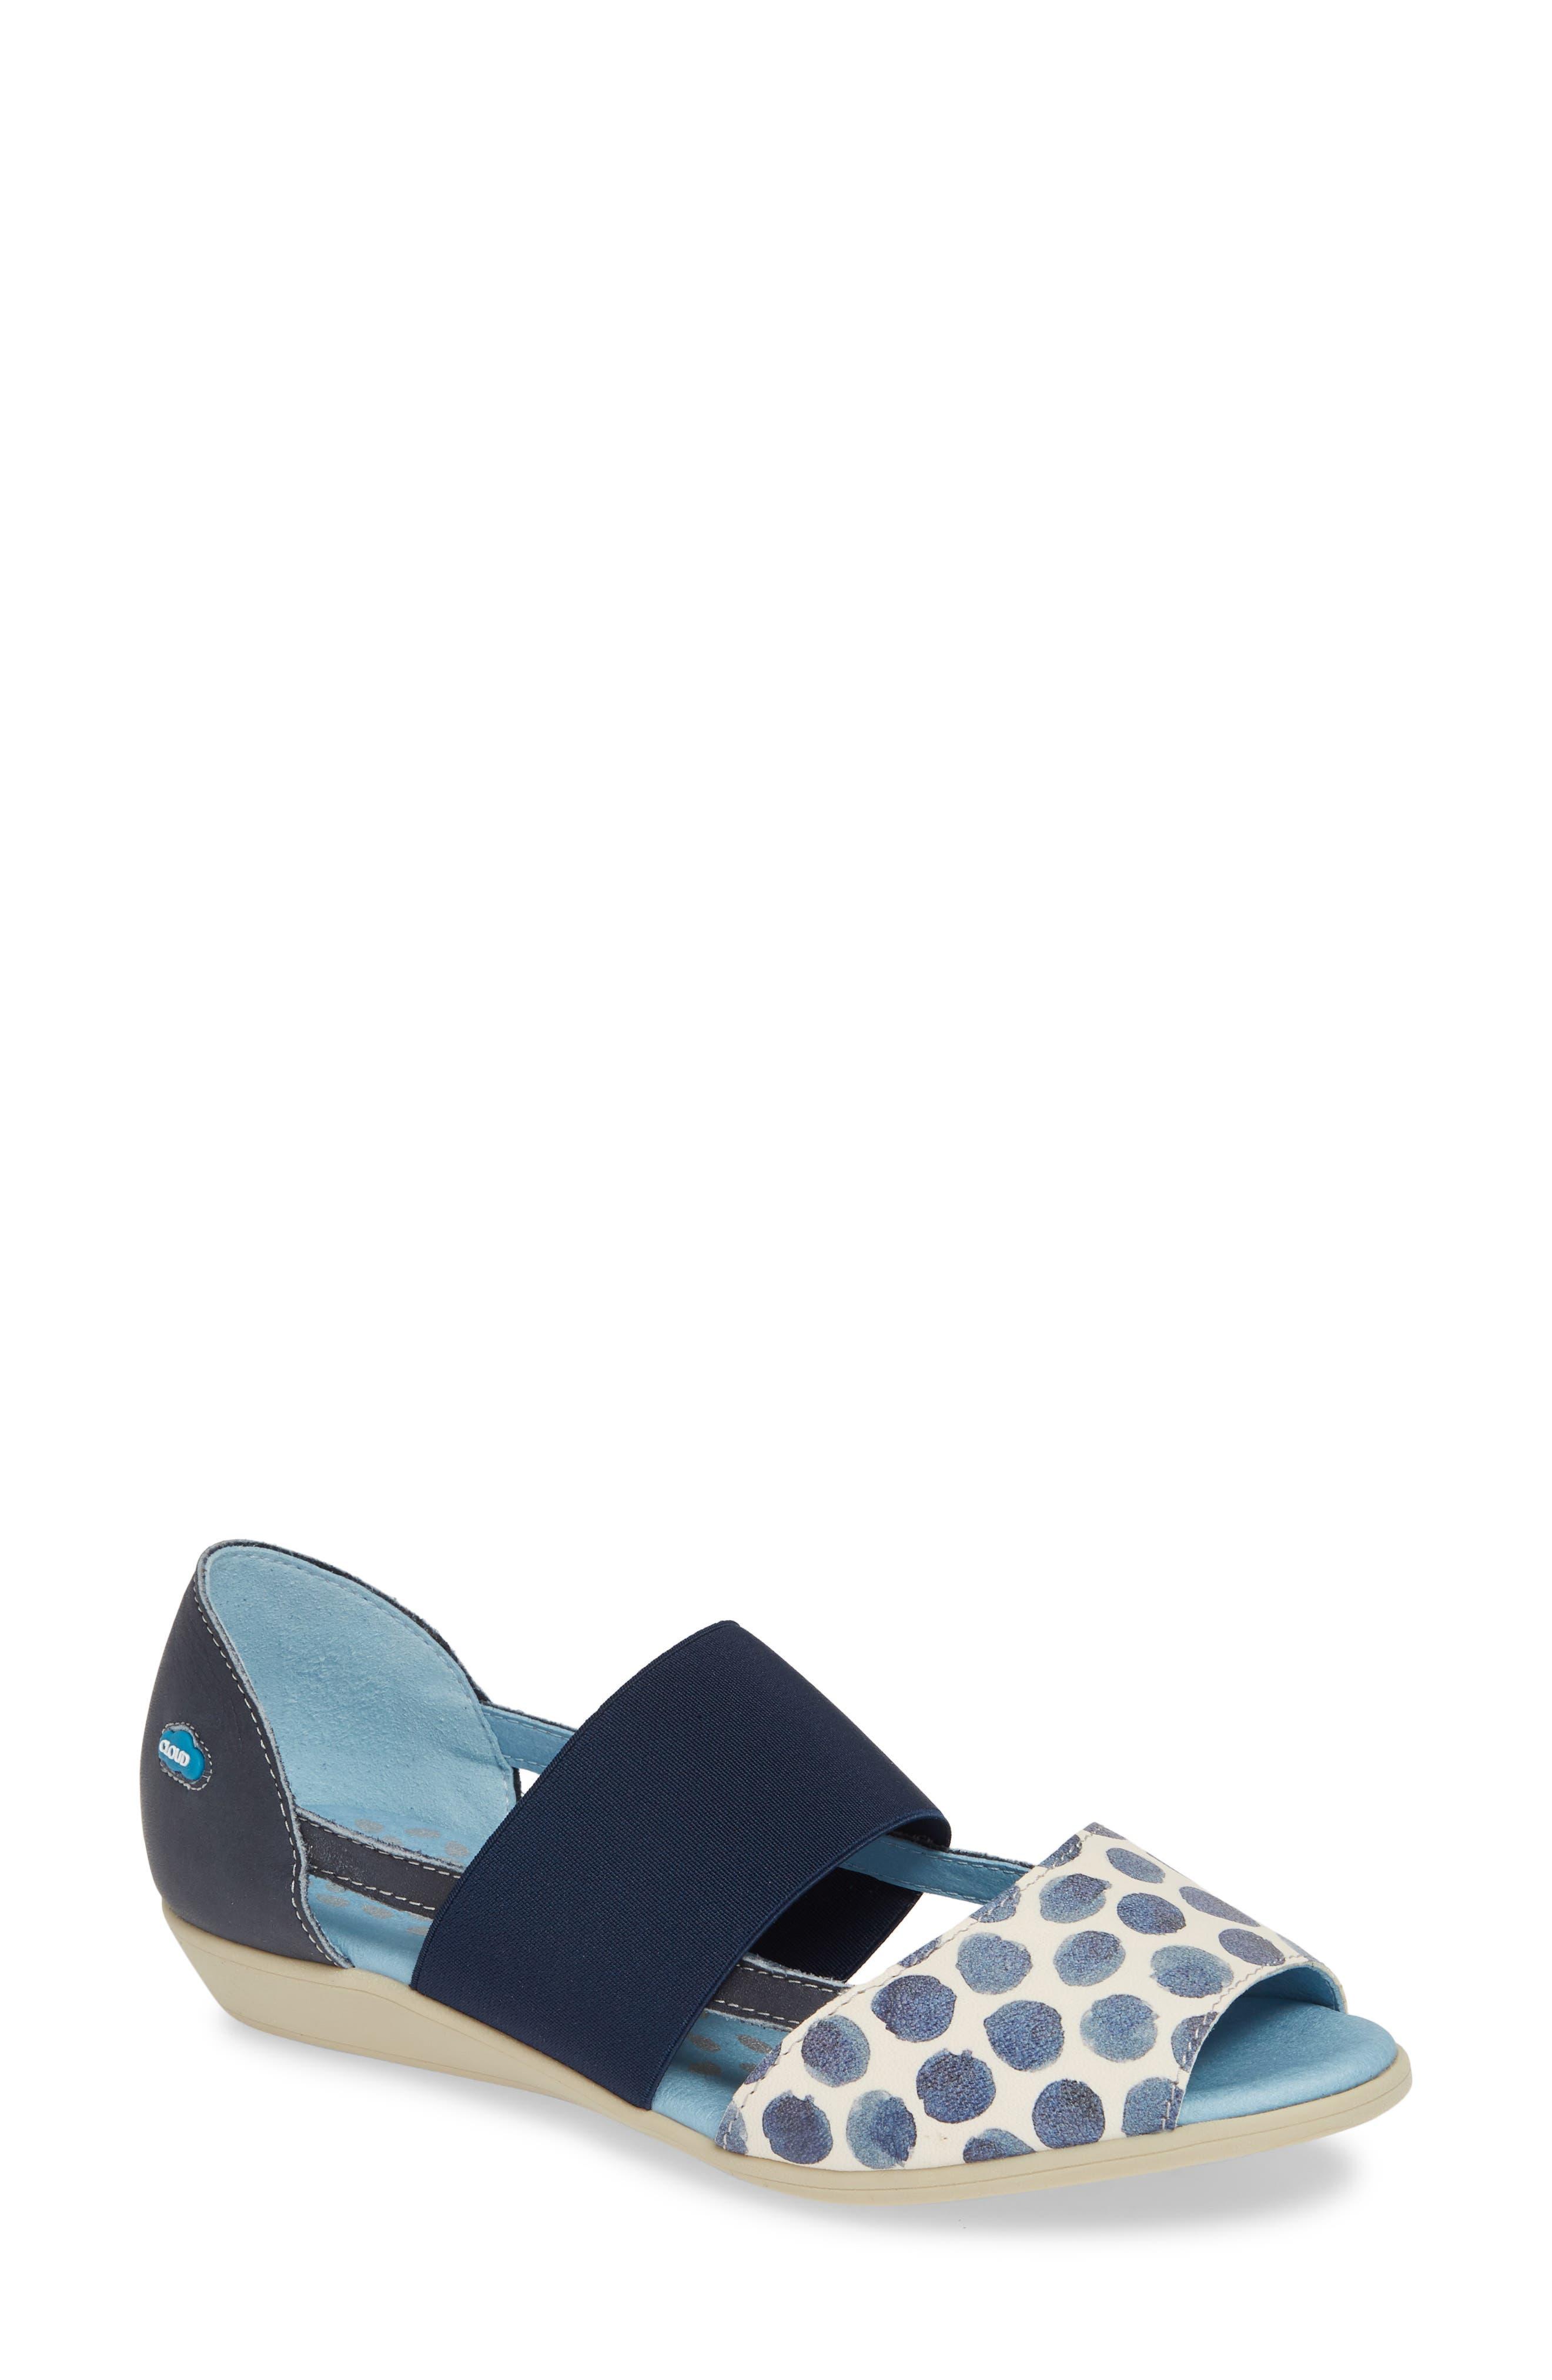 CLOUD 'Canary' Skimmer Sandal, Main, color, TUPAI BLUE LEATHER